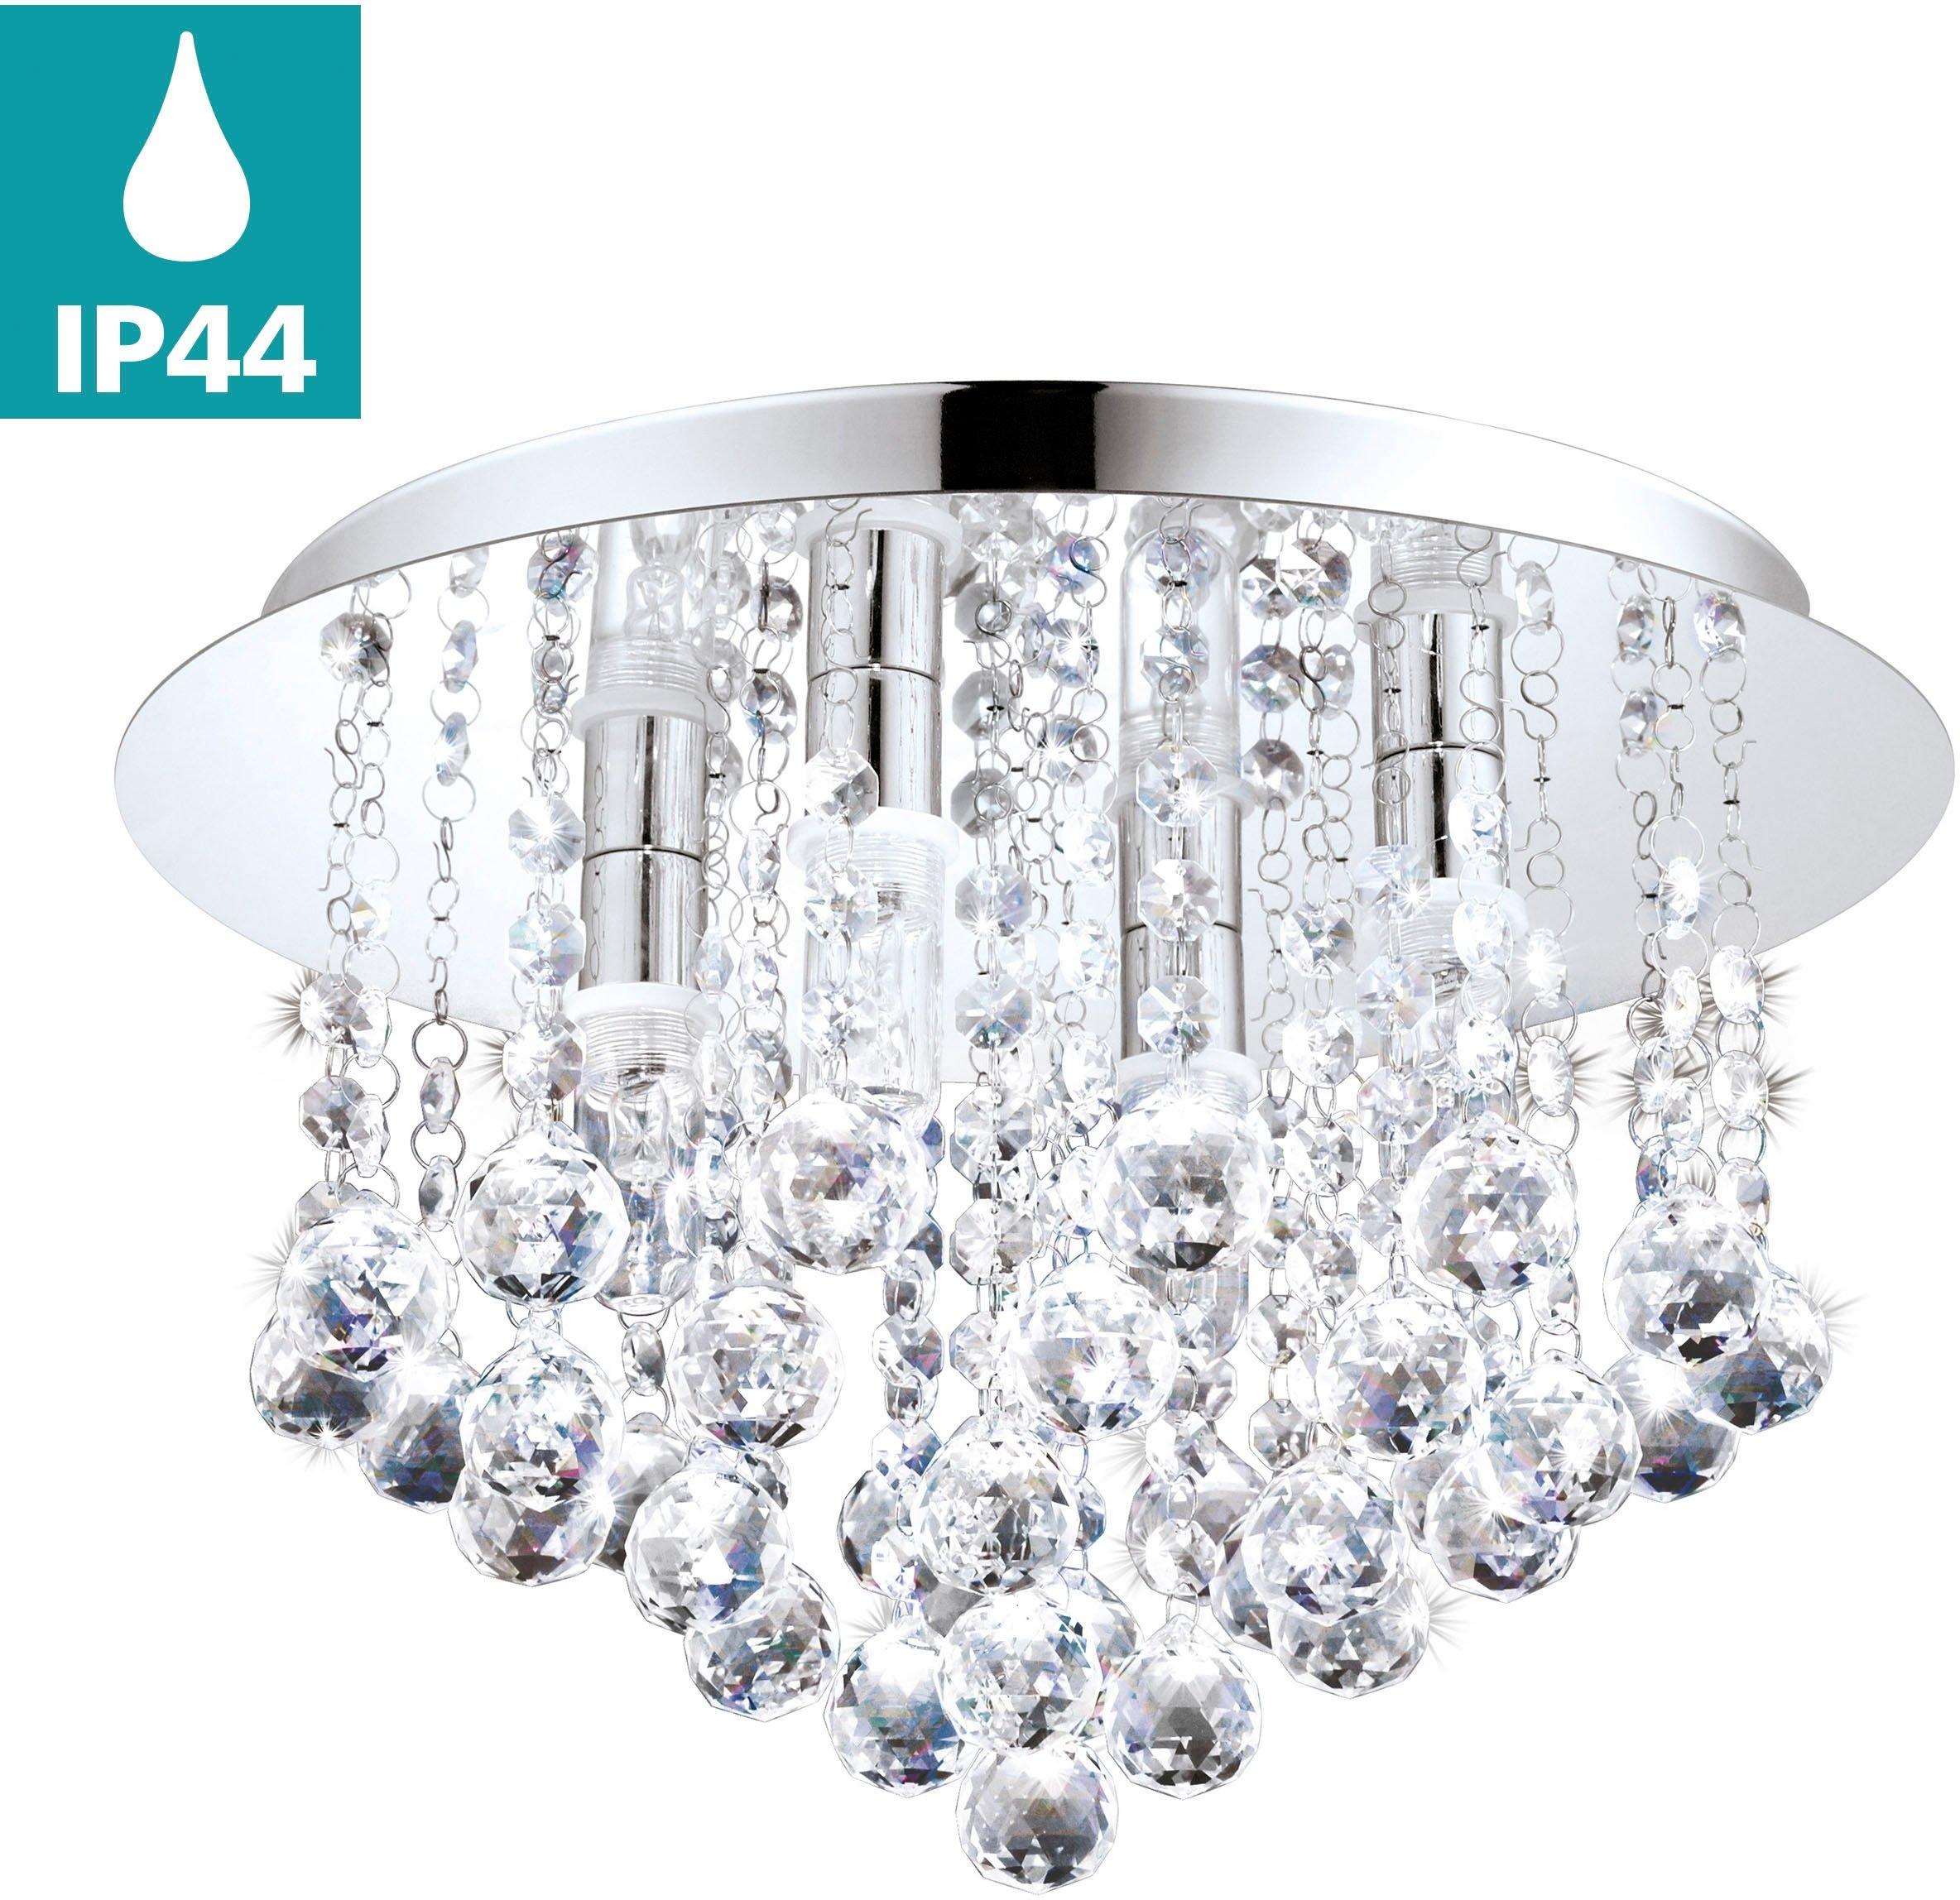 EGLO led-plafondlamp ALMONTE Led plafondlamp bij OTTO online kopen